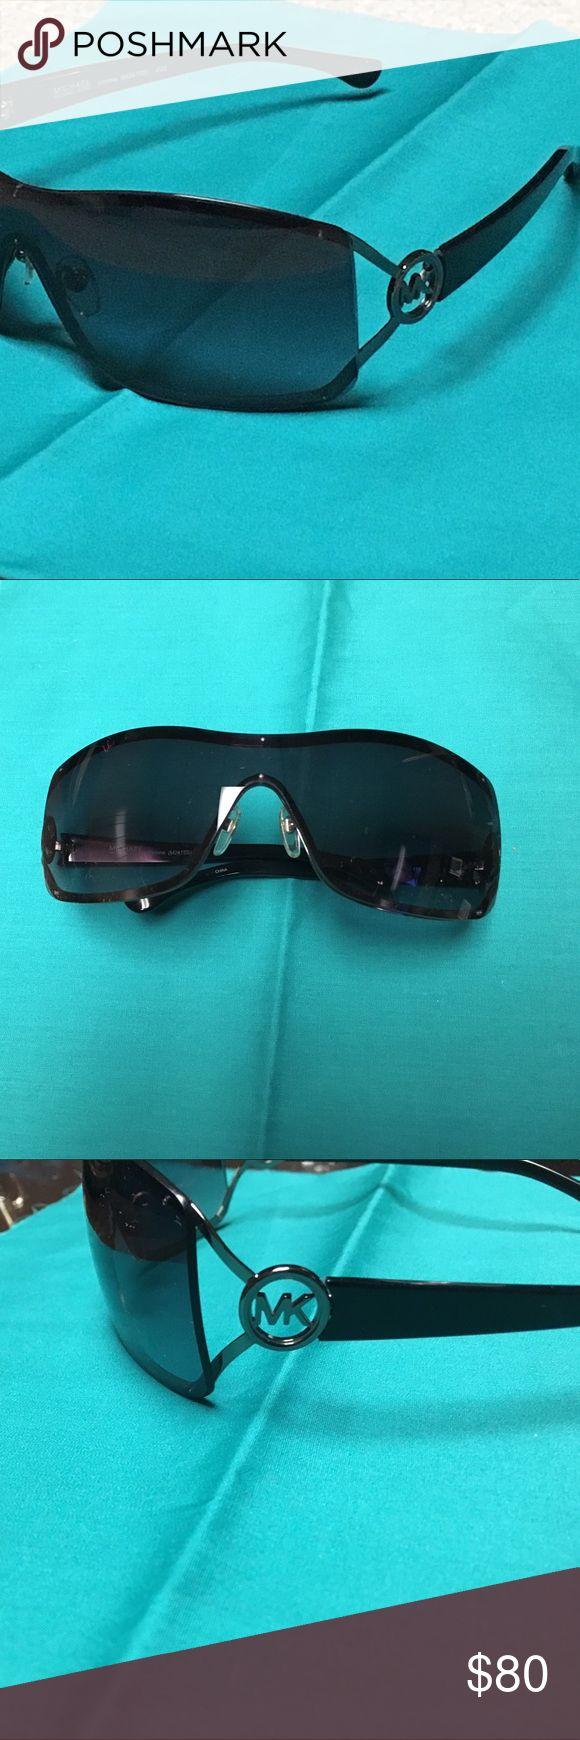 Michael Kors sunglasses NEW & GREAT condition Michael Kors sunglasses NEW & GREAT condition. gunmetal hardware, black sides, MK logo on sides MICHAEL Michael Kors Accessories Glasses